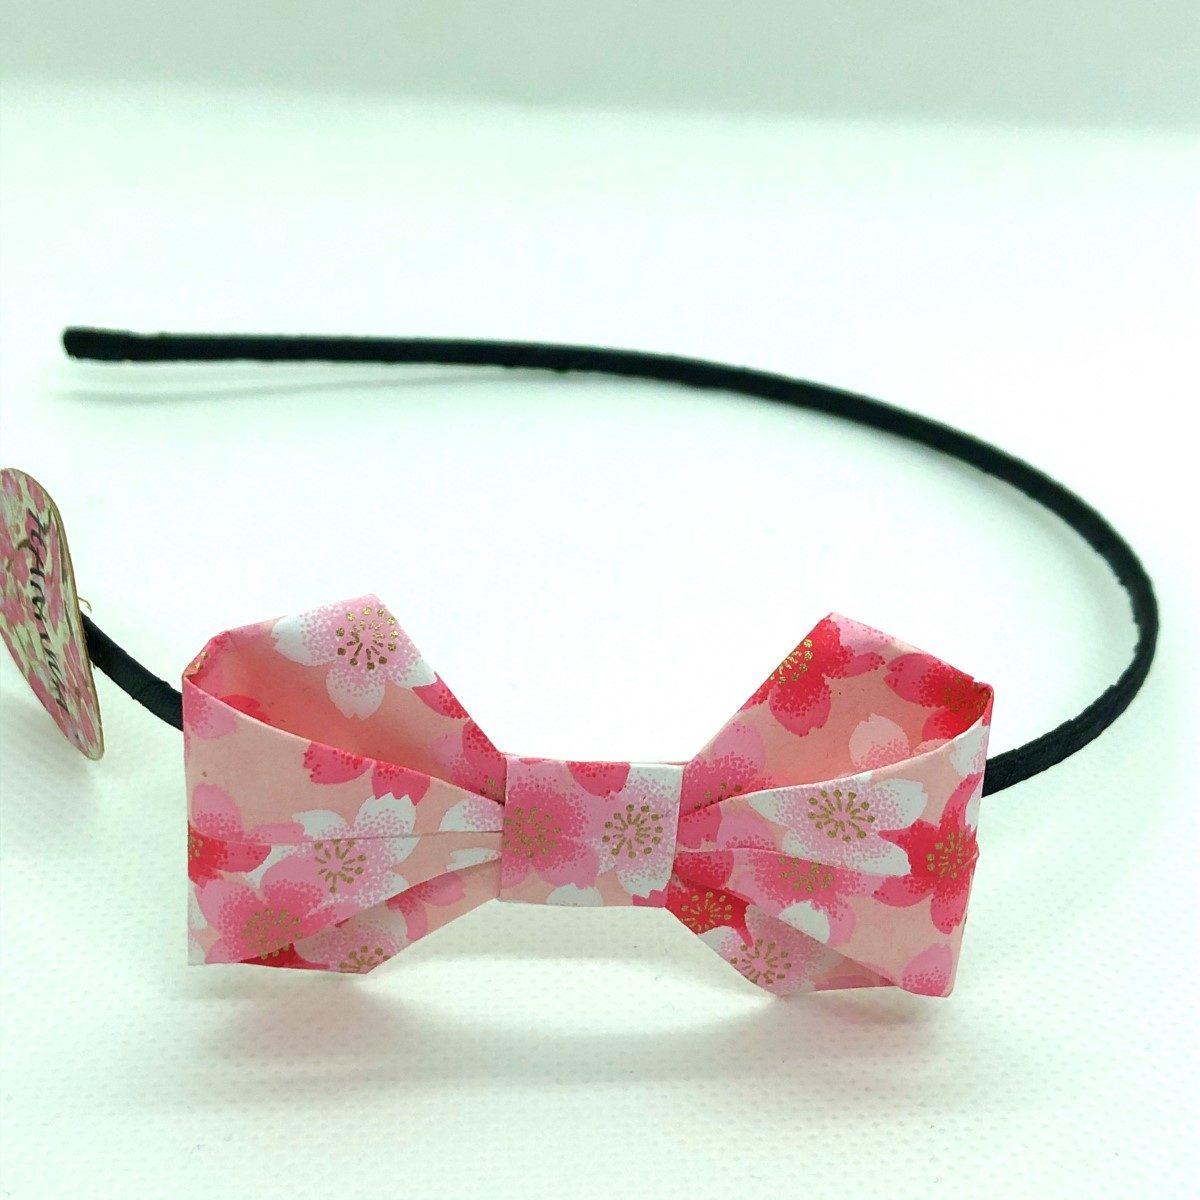 Serre-tête avec nœud en origami rose